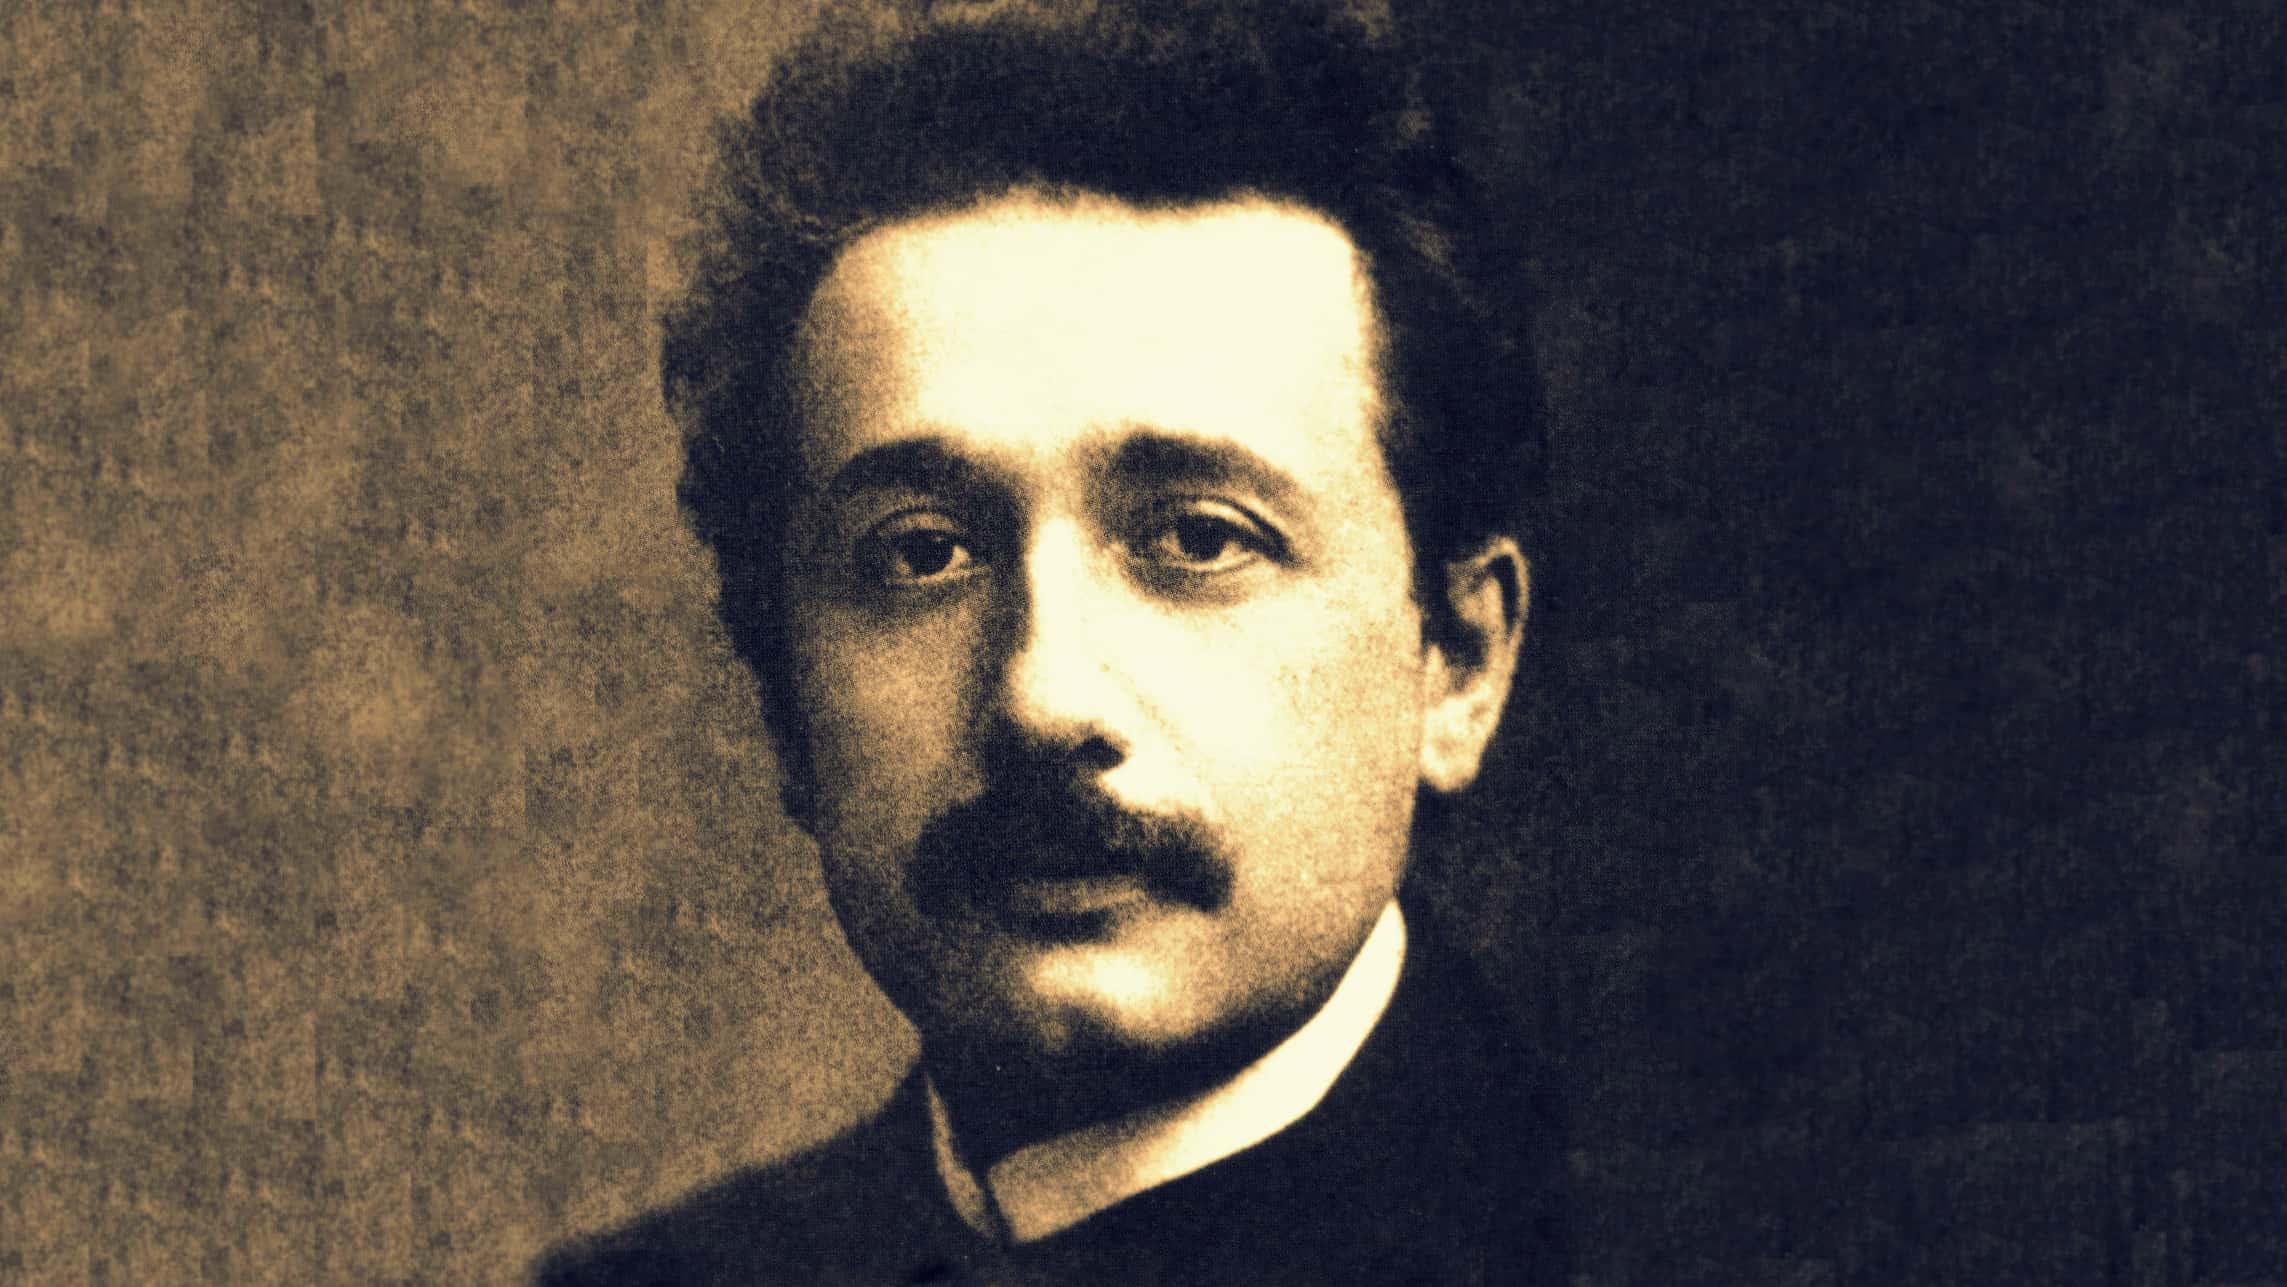 Photo of مرور 100 عام على نظرية آينشتاين النسبية العامة والسايوير 2015